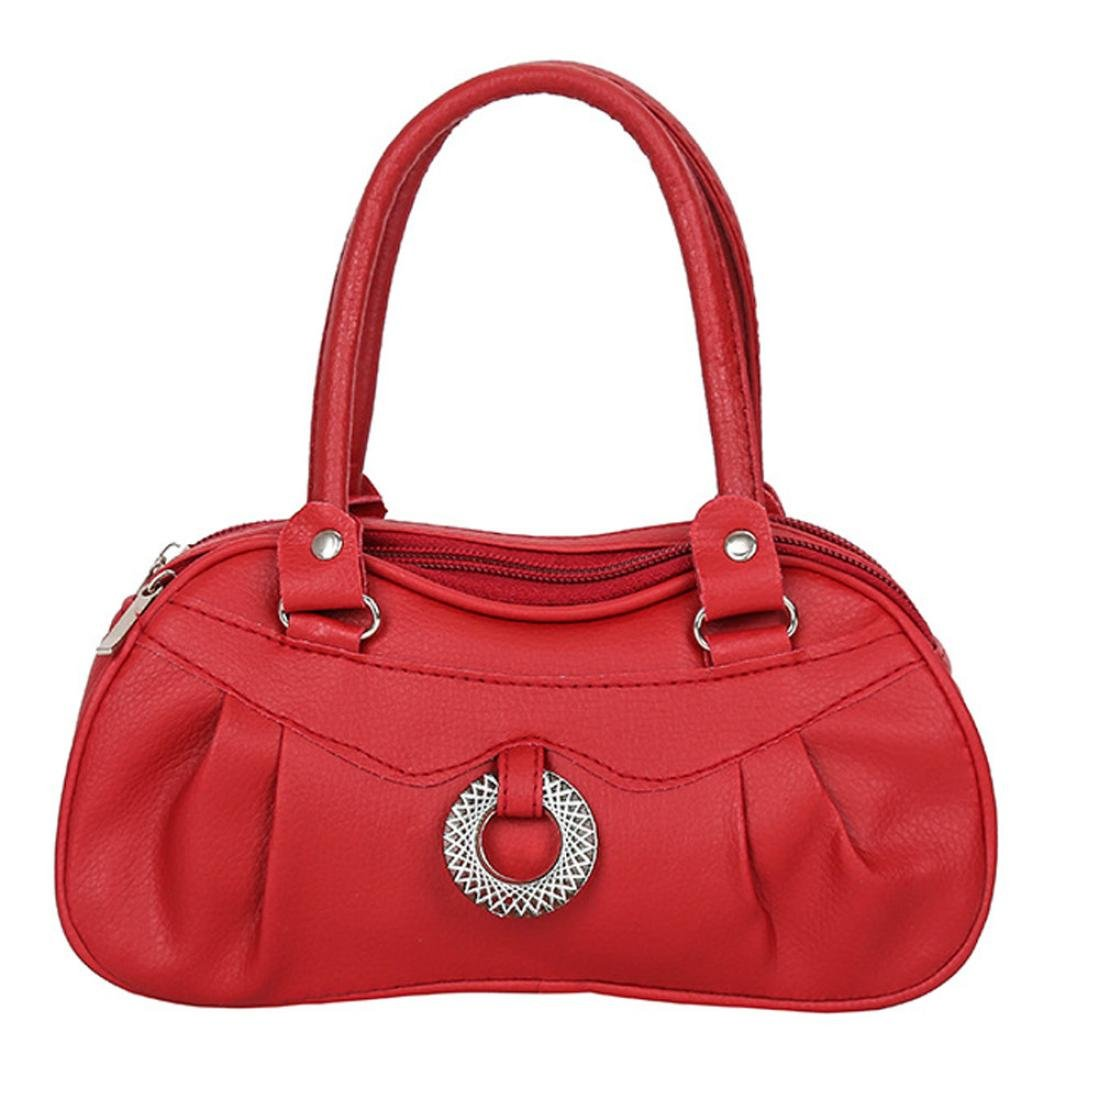 Amazon.com  Rakkiss Women Handbag Shoulder Bag Pure Color Tote Ladies Purse  Fashion Crossbody Bags Messenger Handbag  Beauty de5261fdec4c4